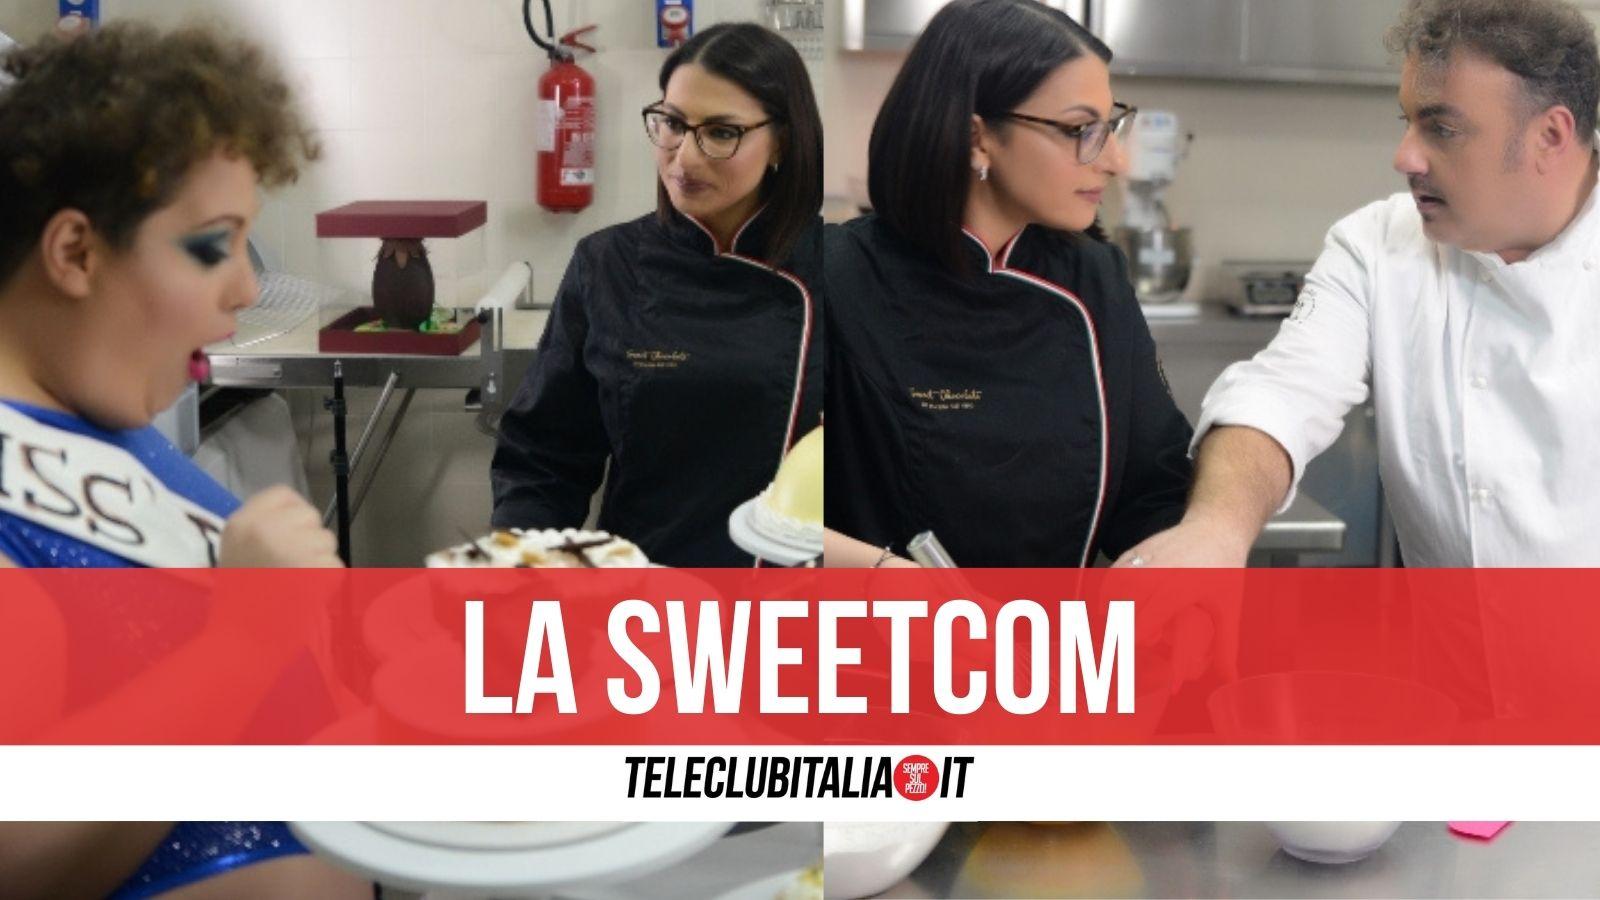 sweet chocolate giugliano rosaria miele peppe laurato